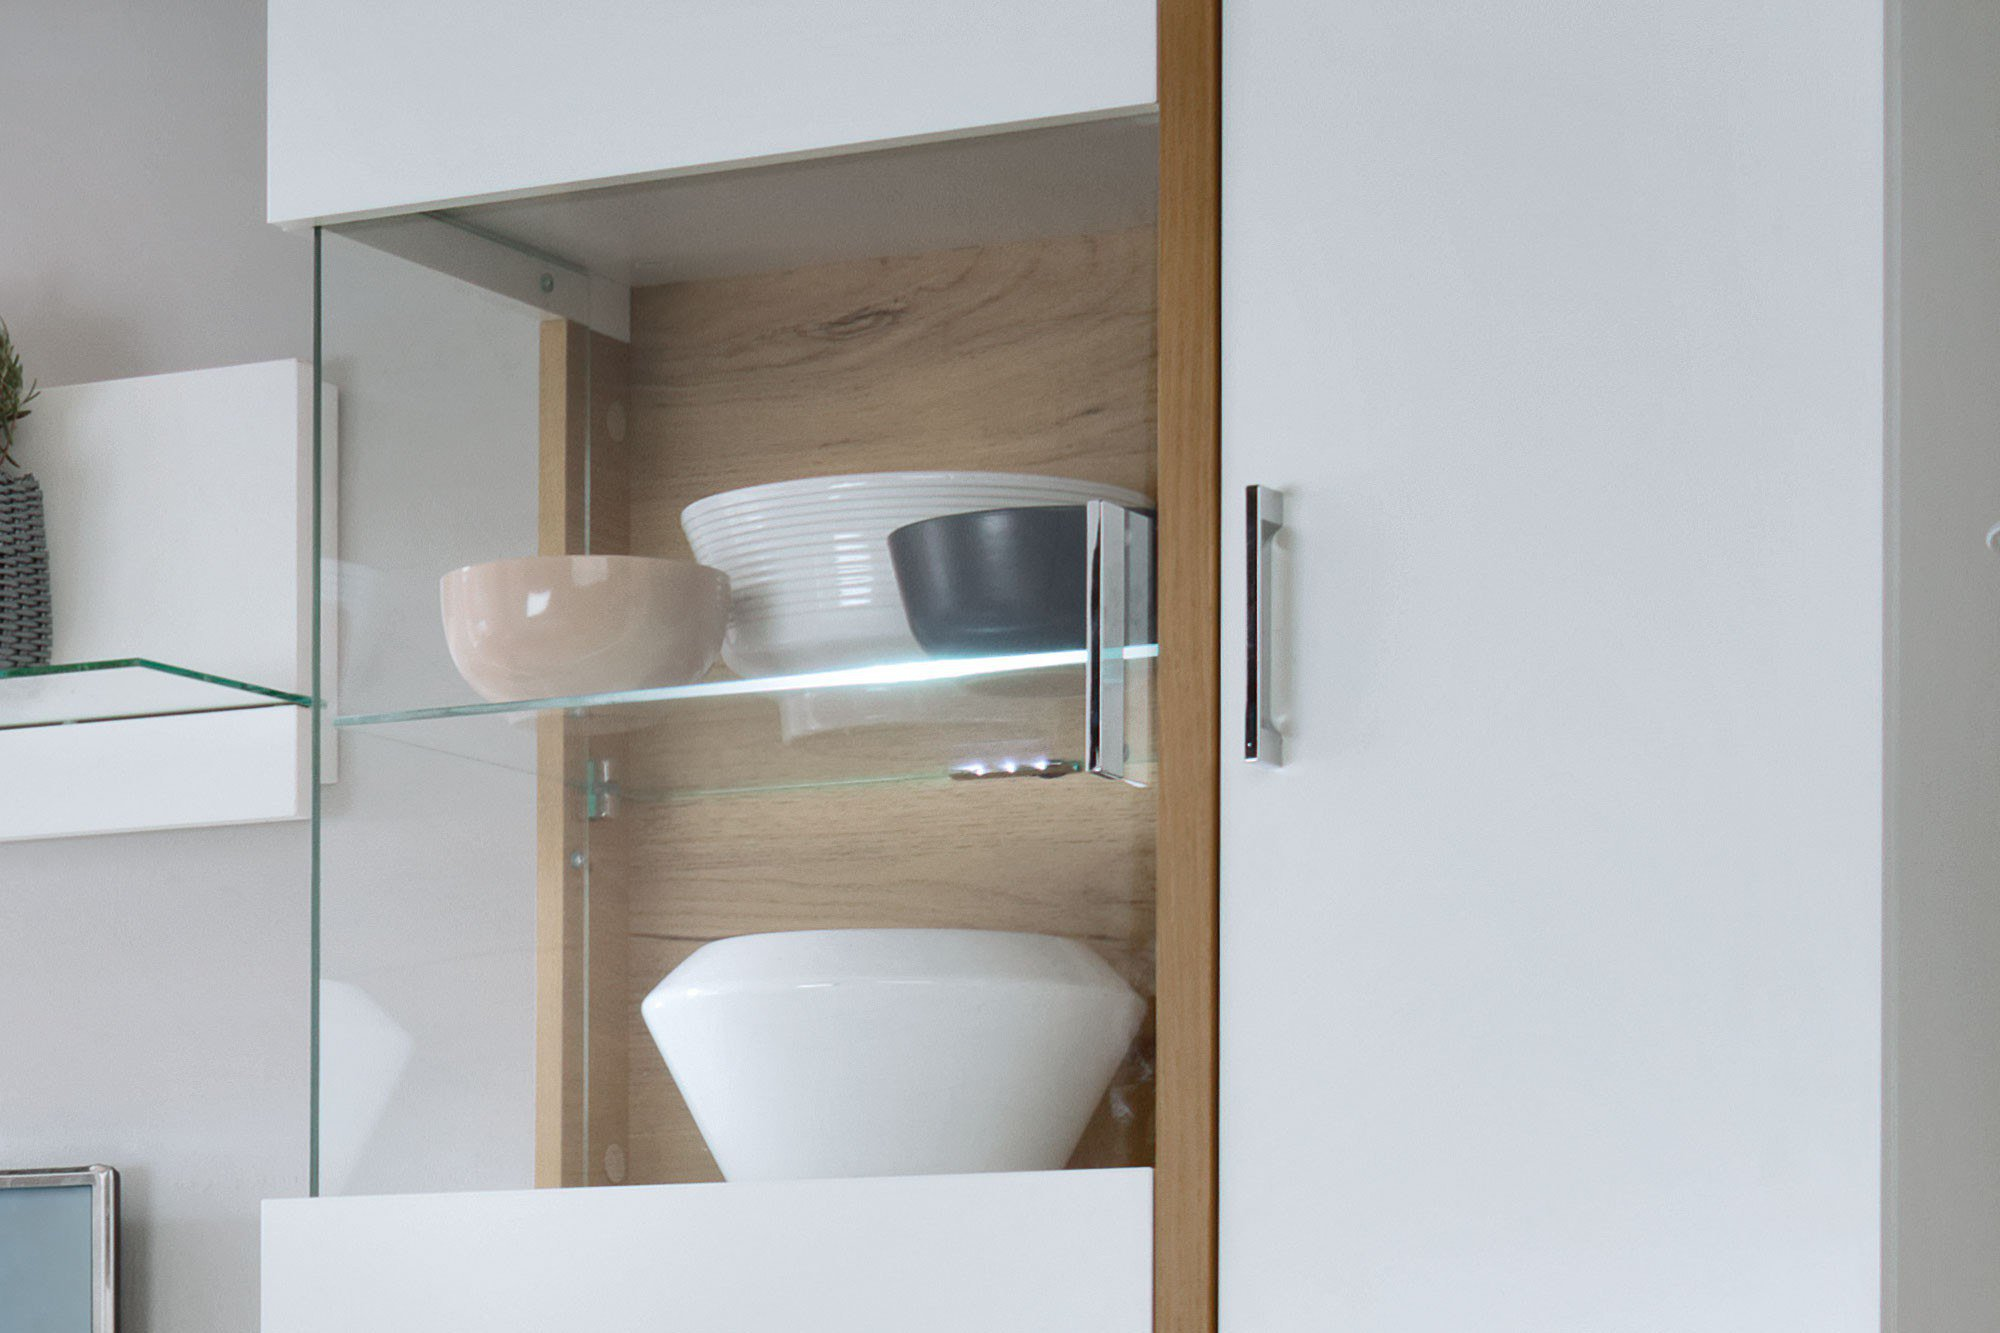 wohnwand trier free vlora von ims living wohnwand inklusive beleuchtung with wohnwand trier. Black Bedroom Furniture Sets. Home Design Ideas